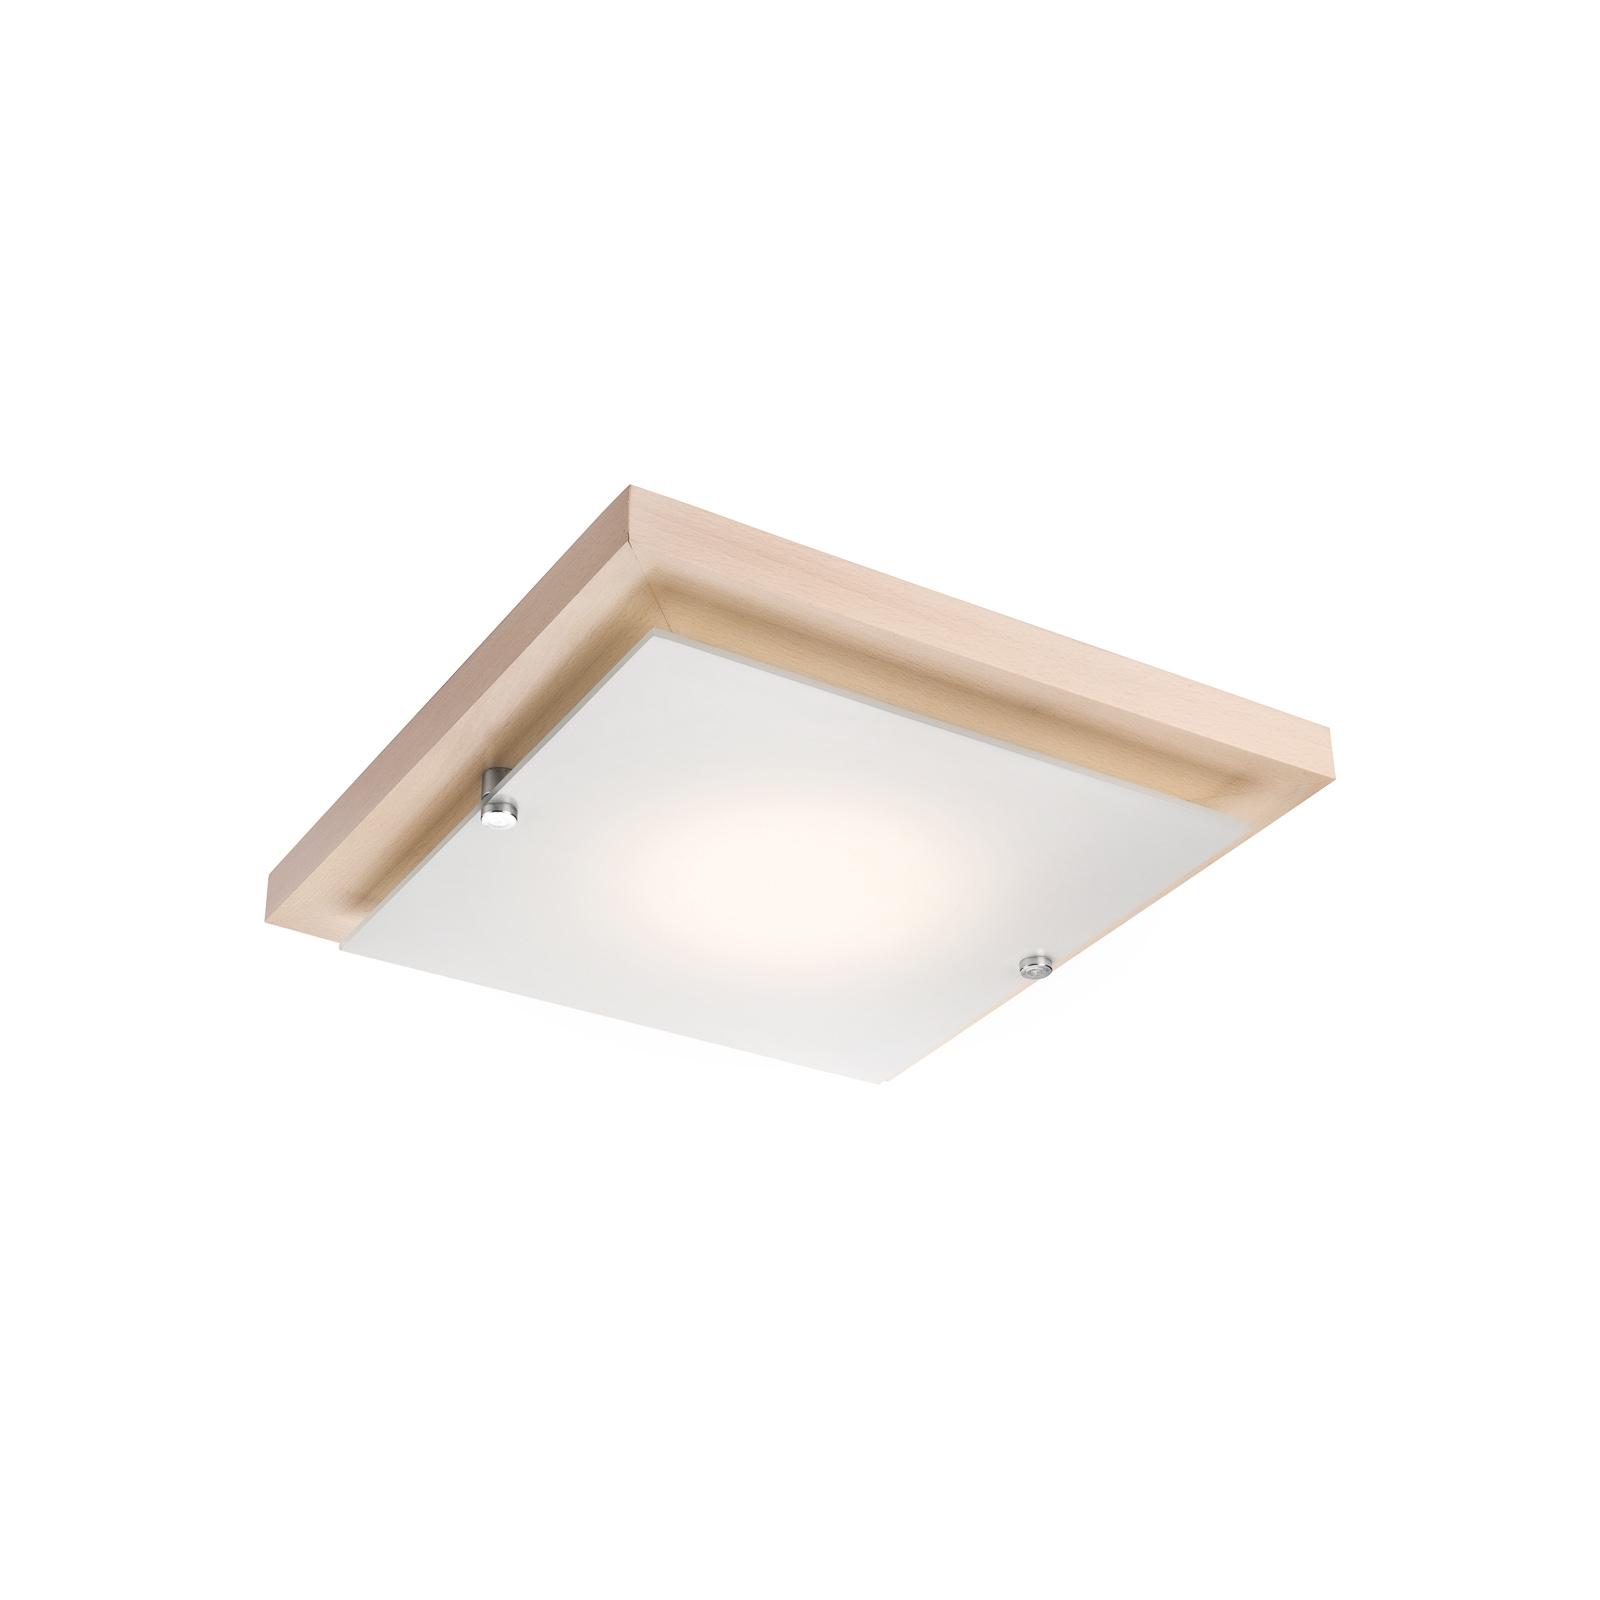 Deckenlampe Kerio, 30x30 cm, Kiefer natur